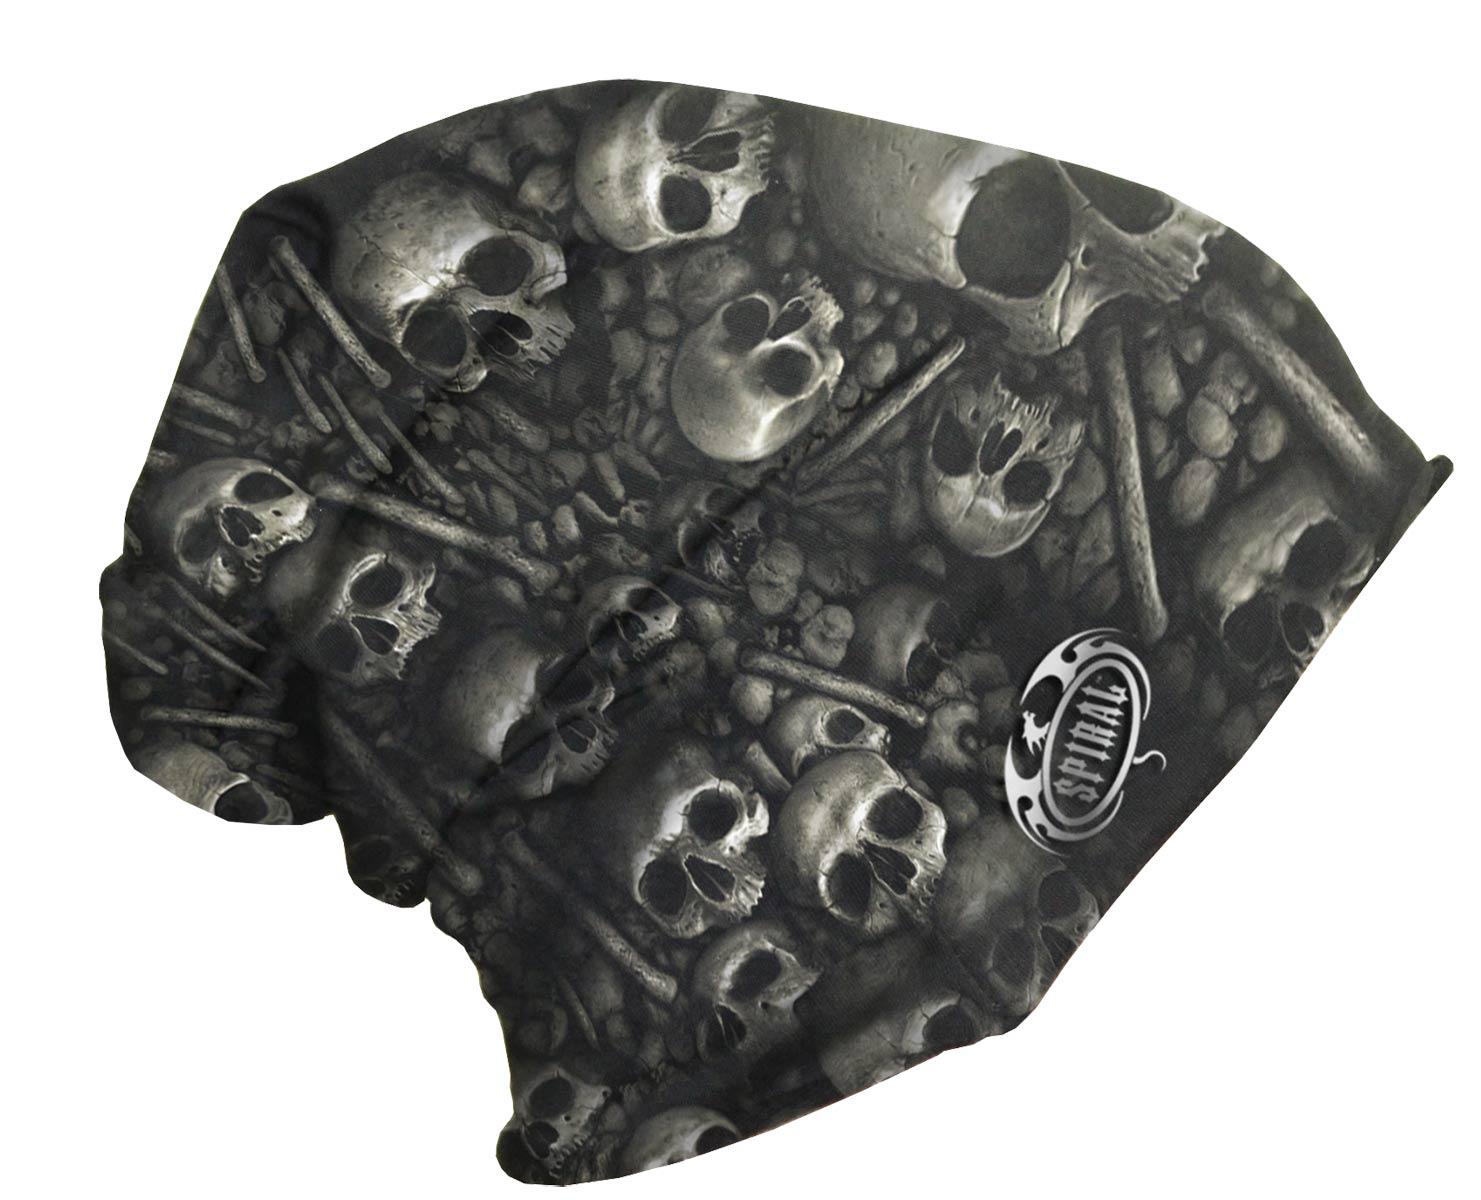 SPIRAL Catacomb Light Cotton Beanies Black T111A801